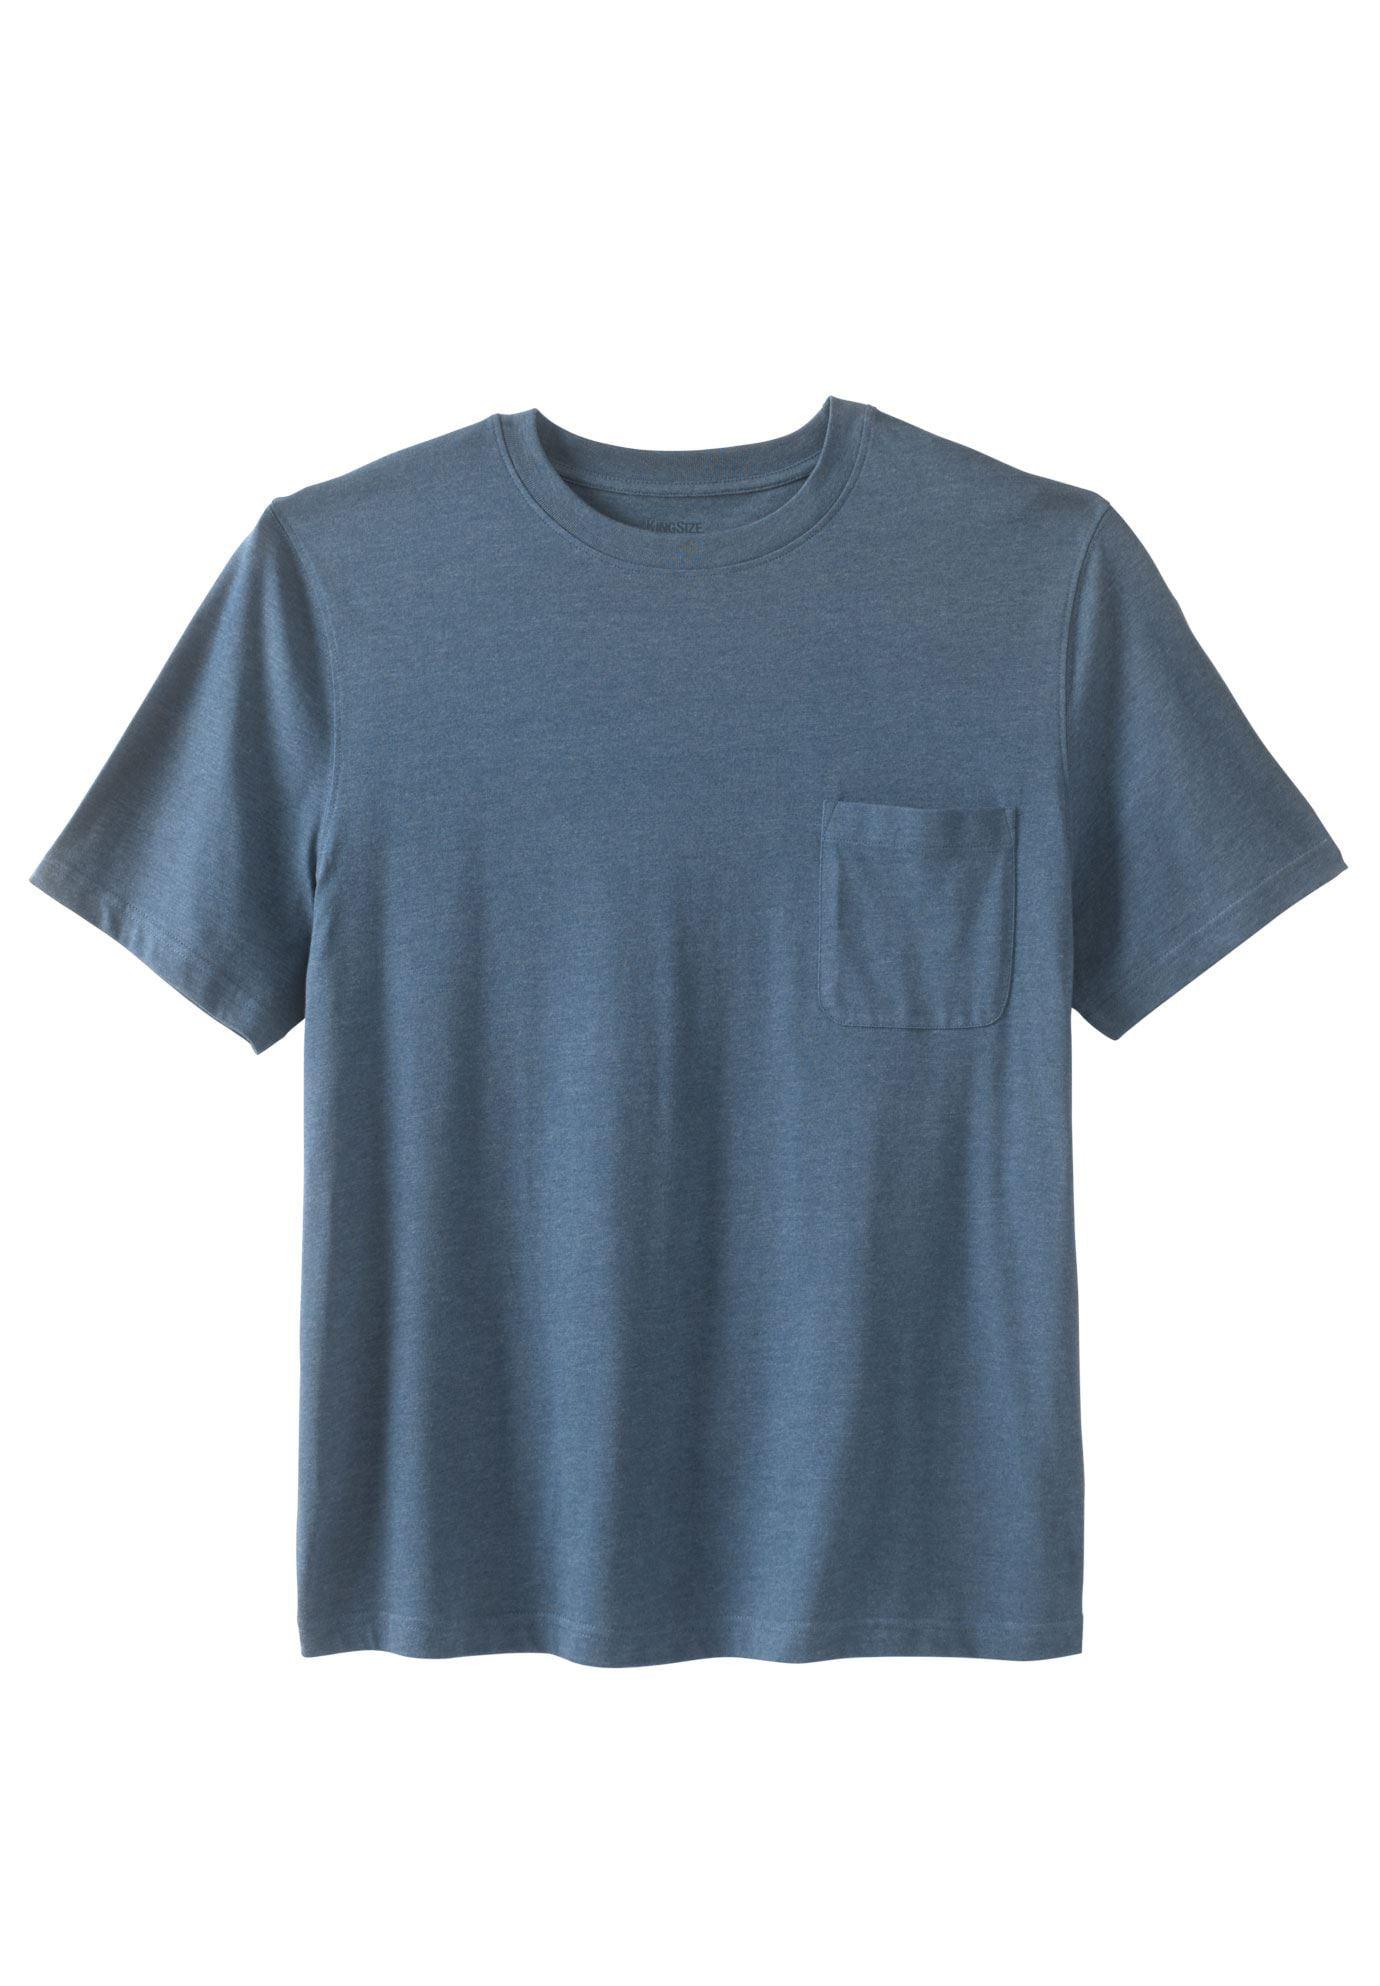 708dae3cc760b2 Kingsize - Kingsize Men's Big & Tall Lightweight Pocket Crewneck T-shirt -  Walmart.com